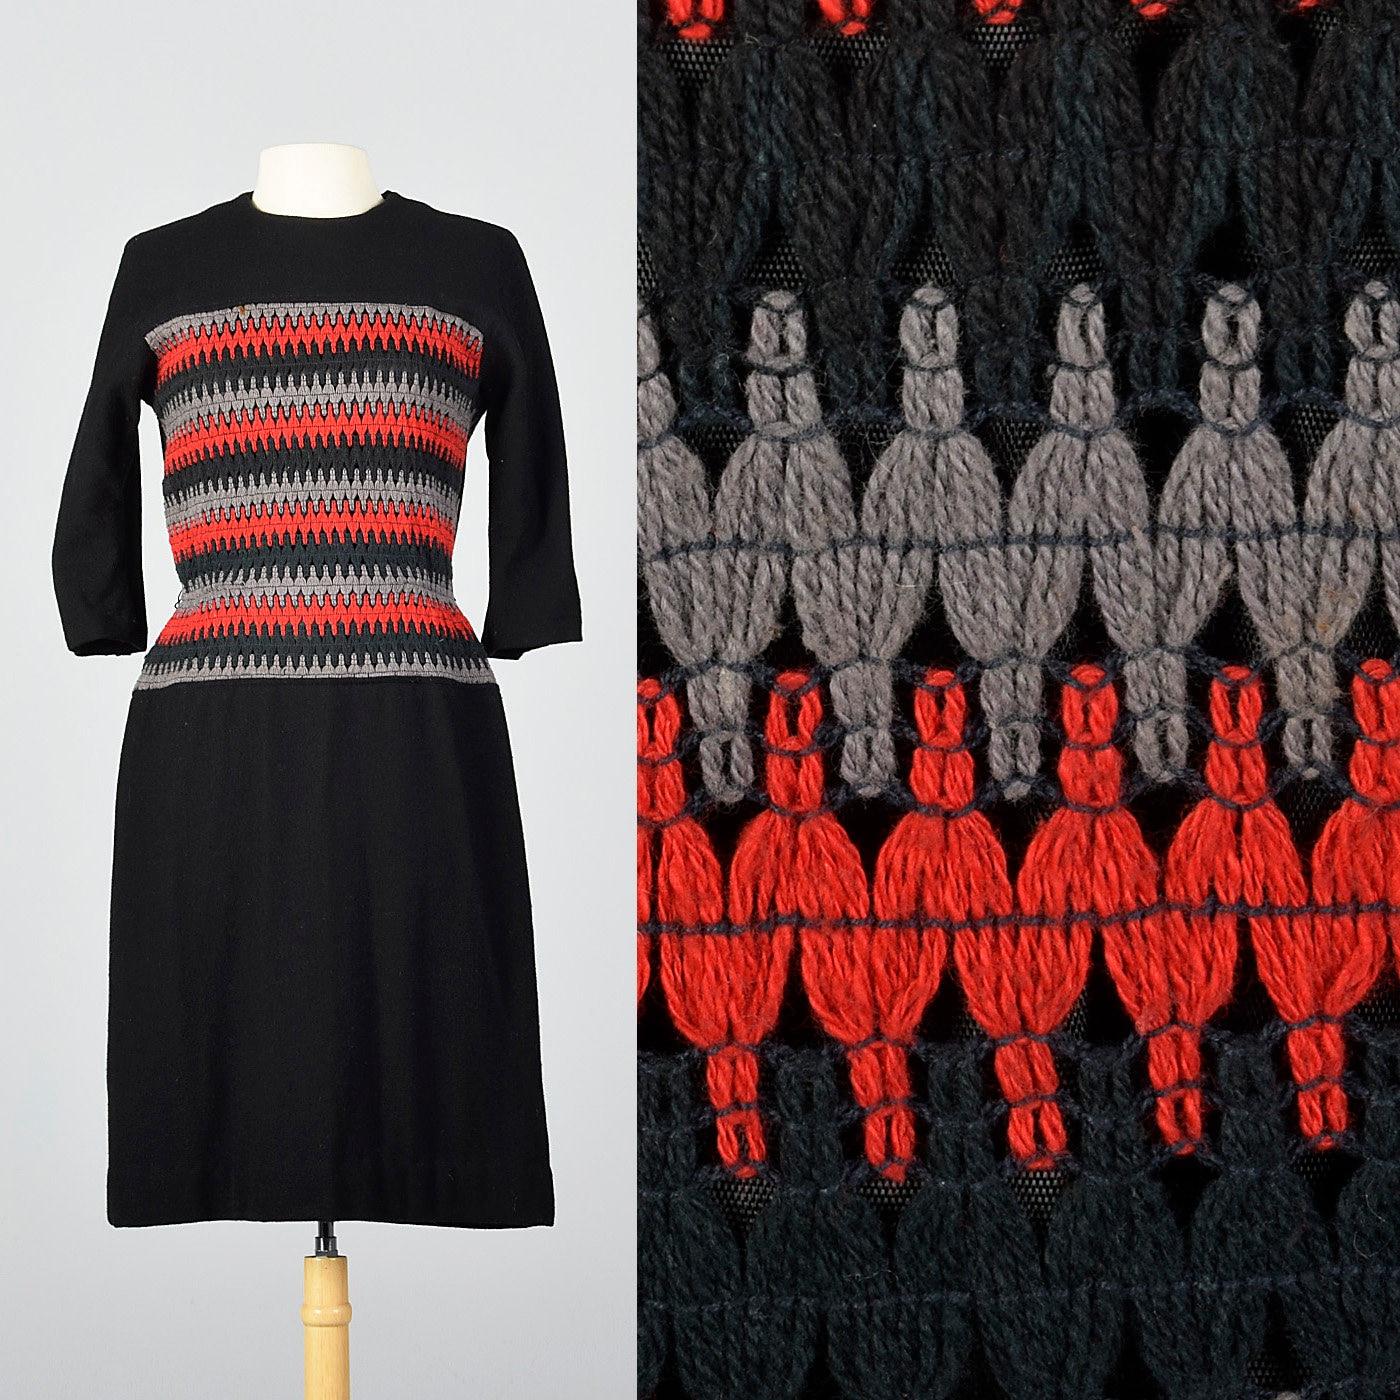 1950s Hats: Pillbox, Fascinator, Wedding, Sun Hats Medium 1950S Dress Black Wool Dolman 34 Sleeves Red Gray Striped Autumn Vintage 50S $0.00 AT vintagedancer.com